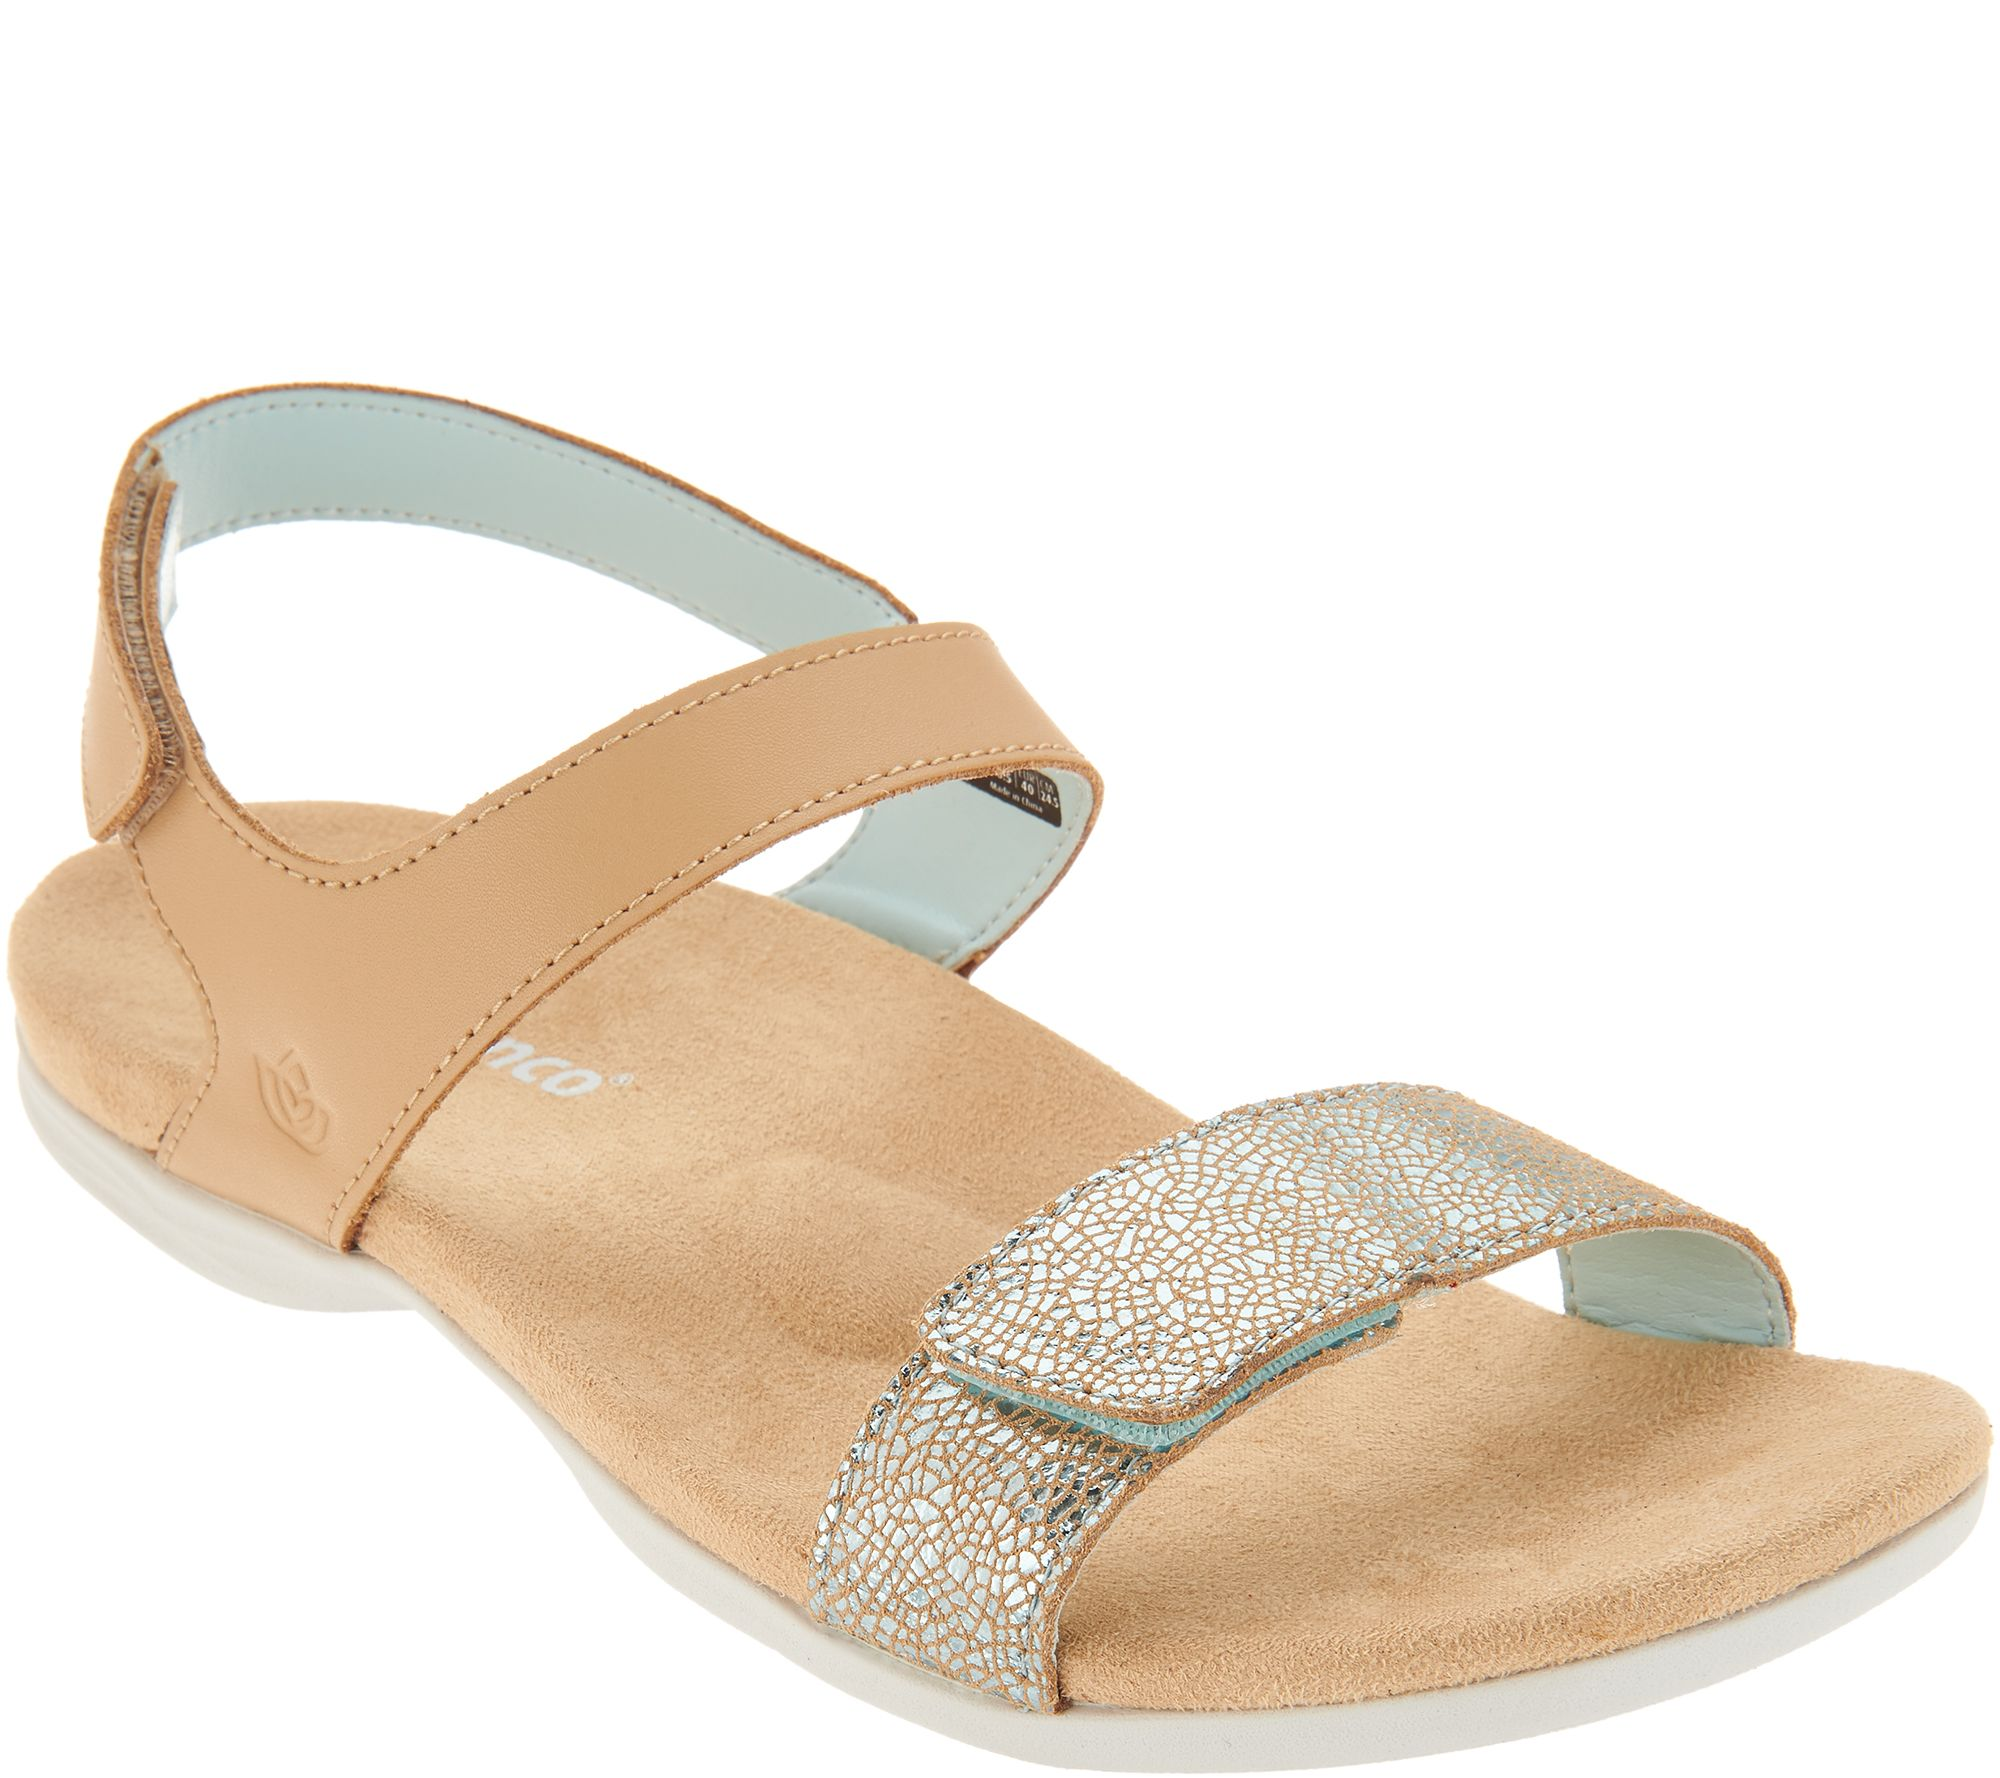 d8d39da28ffb9 Spenco Orthotic Adjustable Backstrap Sandals - Milan - Page 1 — QVC.com